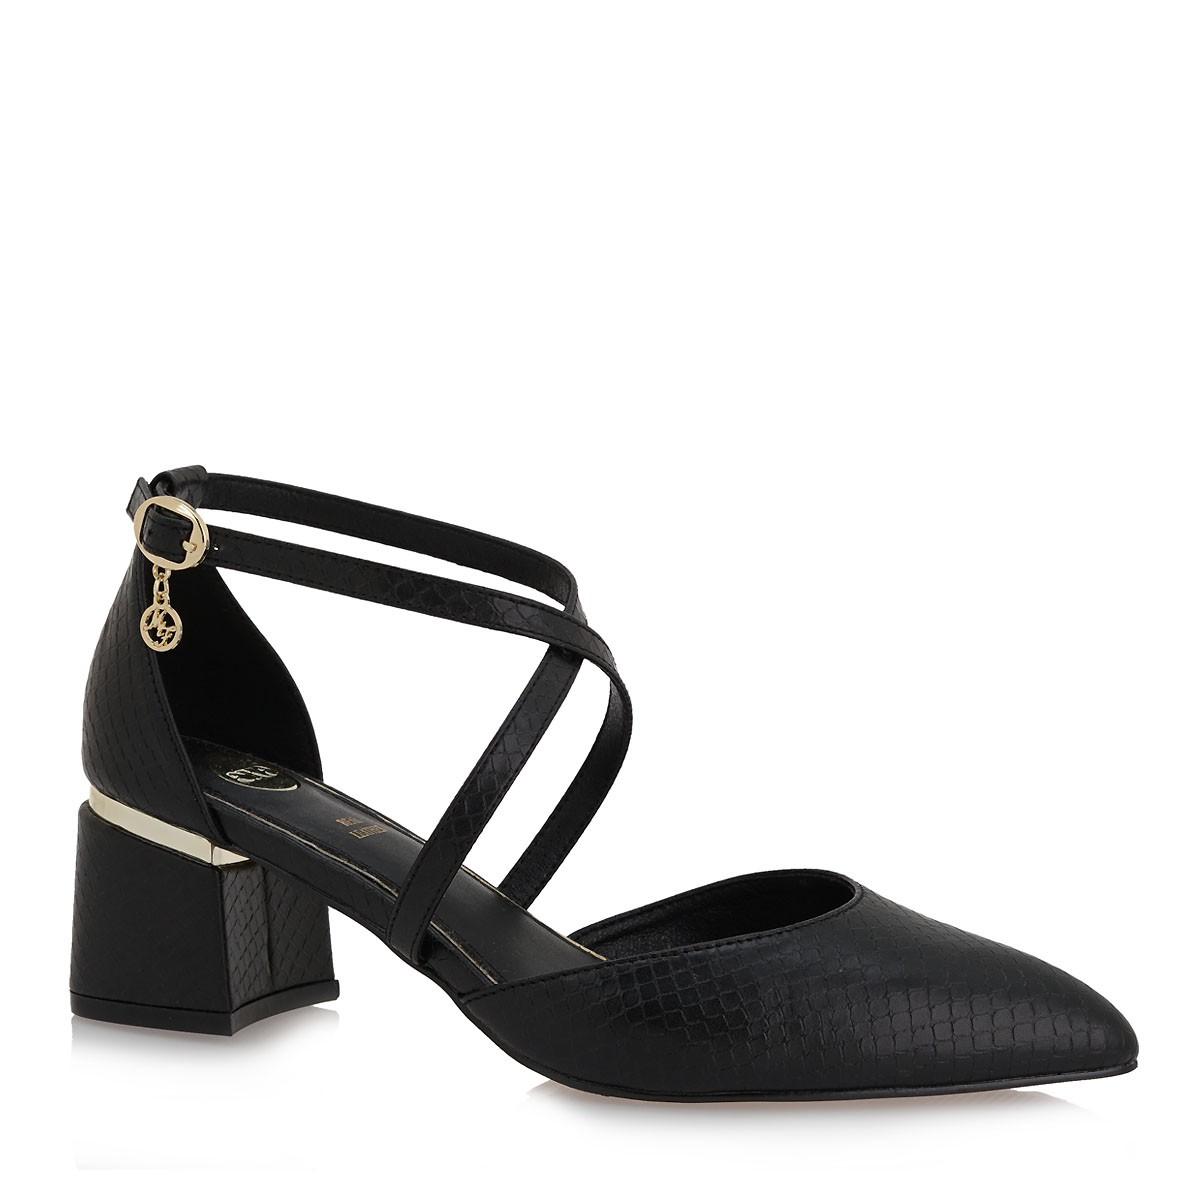 Exe Shoes Γυναικείες Γόβες 051-700 RIMINI-510 Μαύρο Φίδι L17000513006